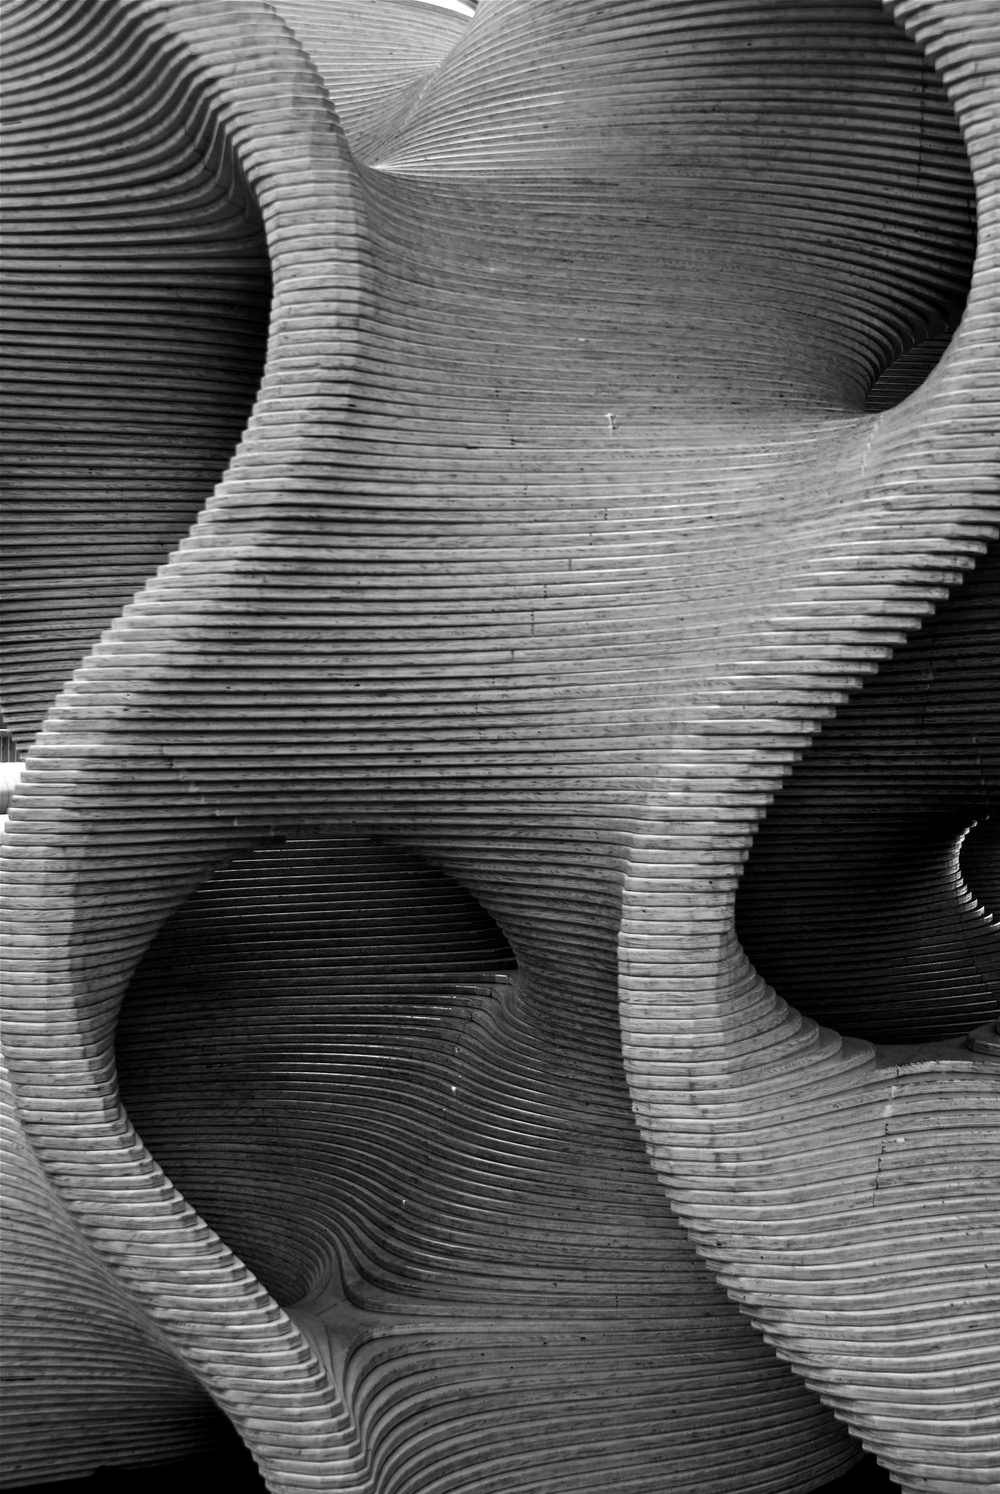 Gyroid sculpture at the Exploratorium, San Francisco, California, USA